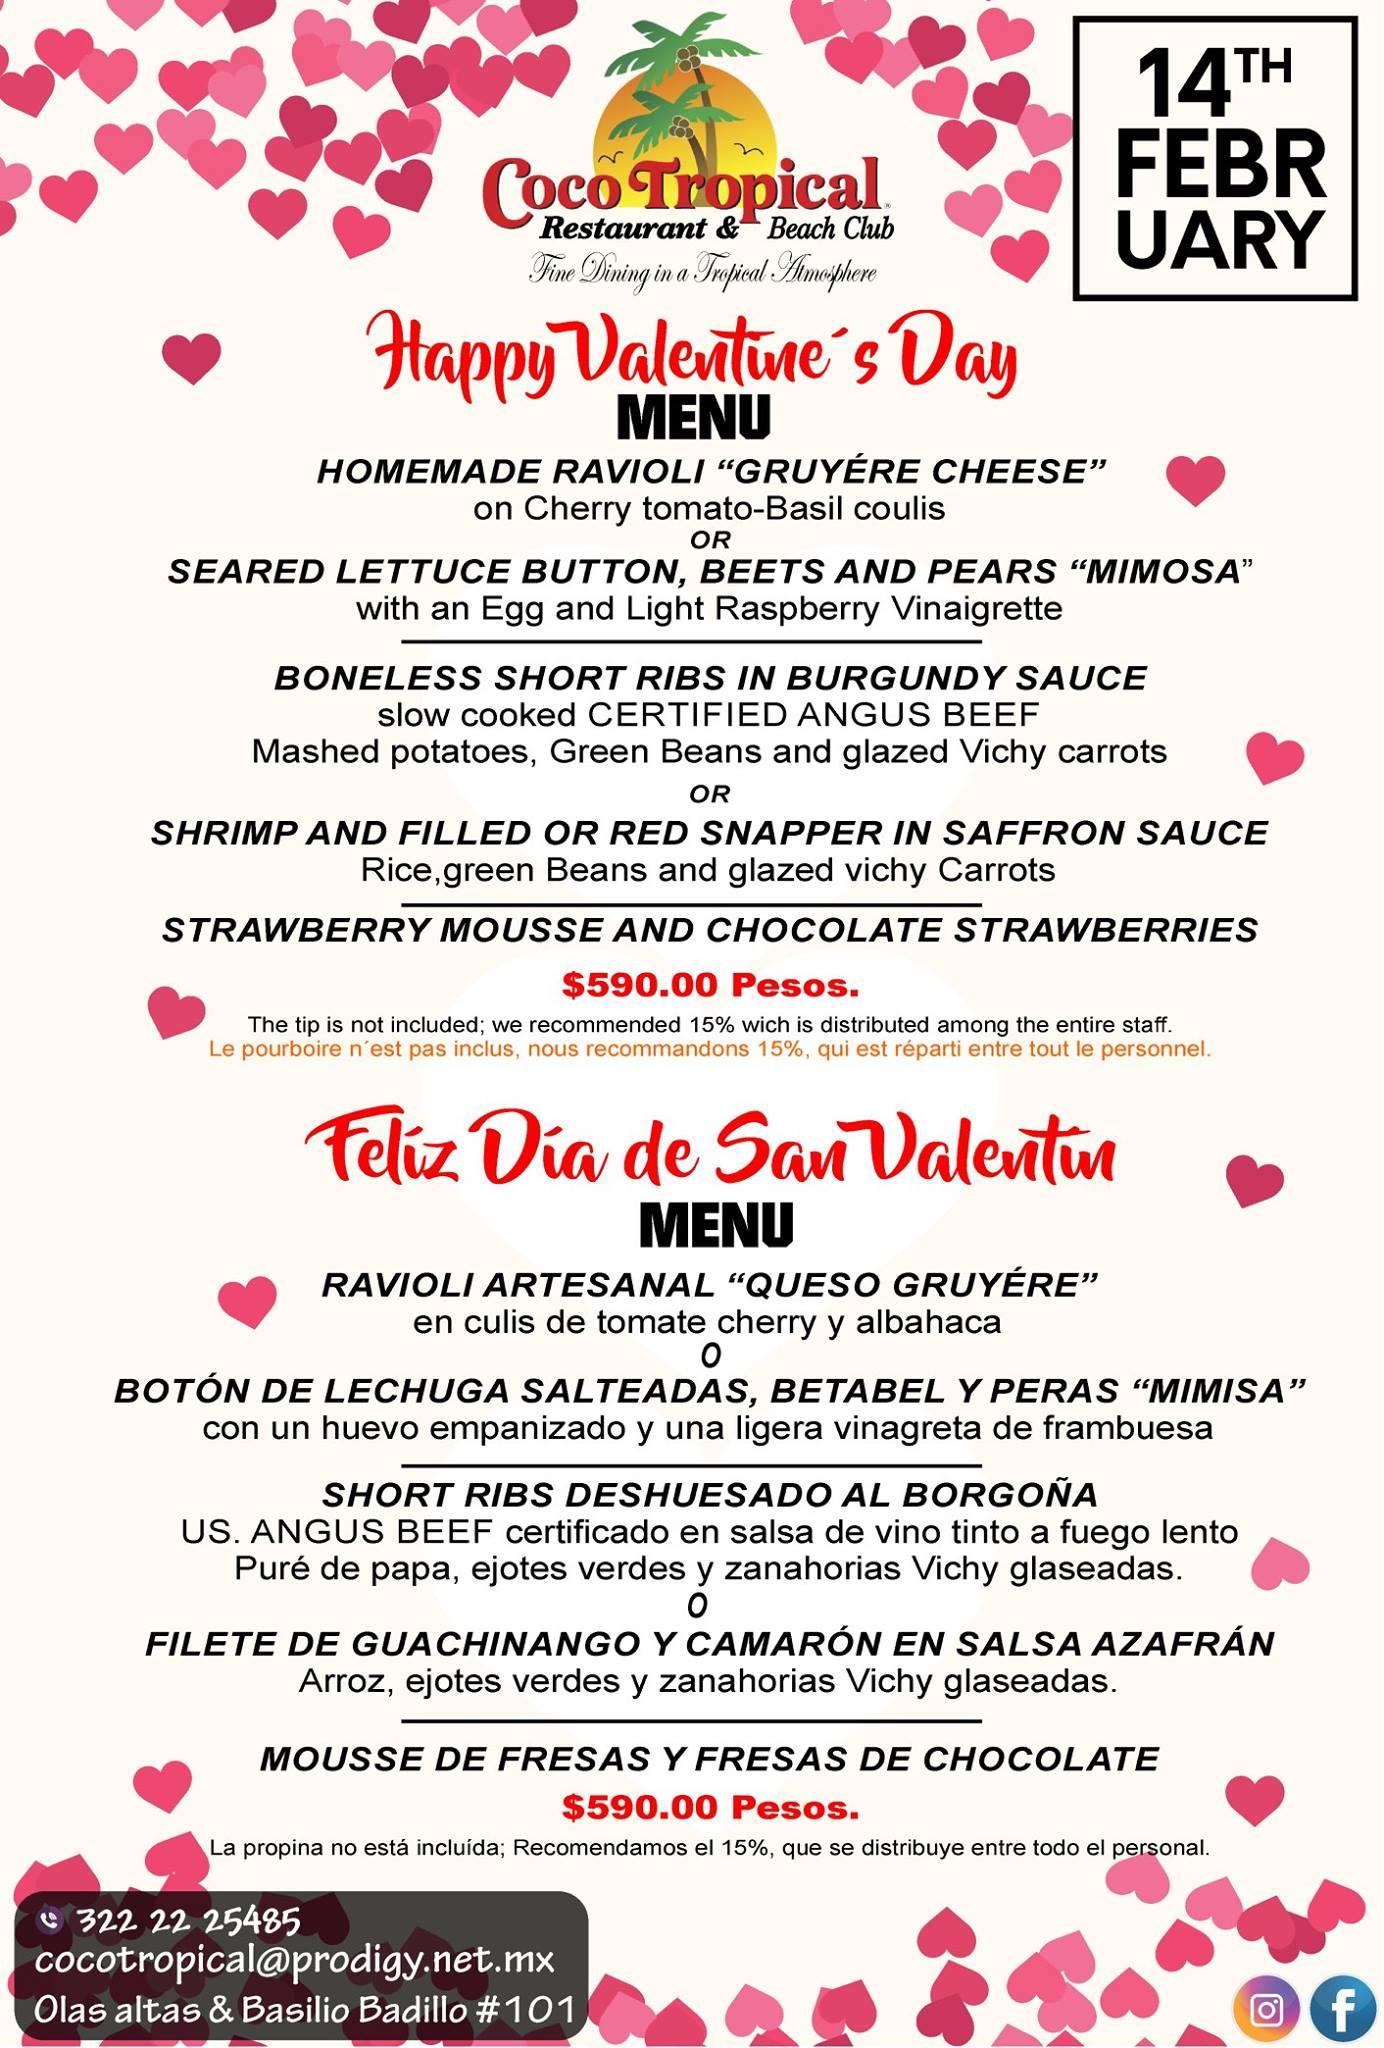 Valentine's day coco tropical